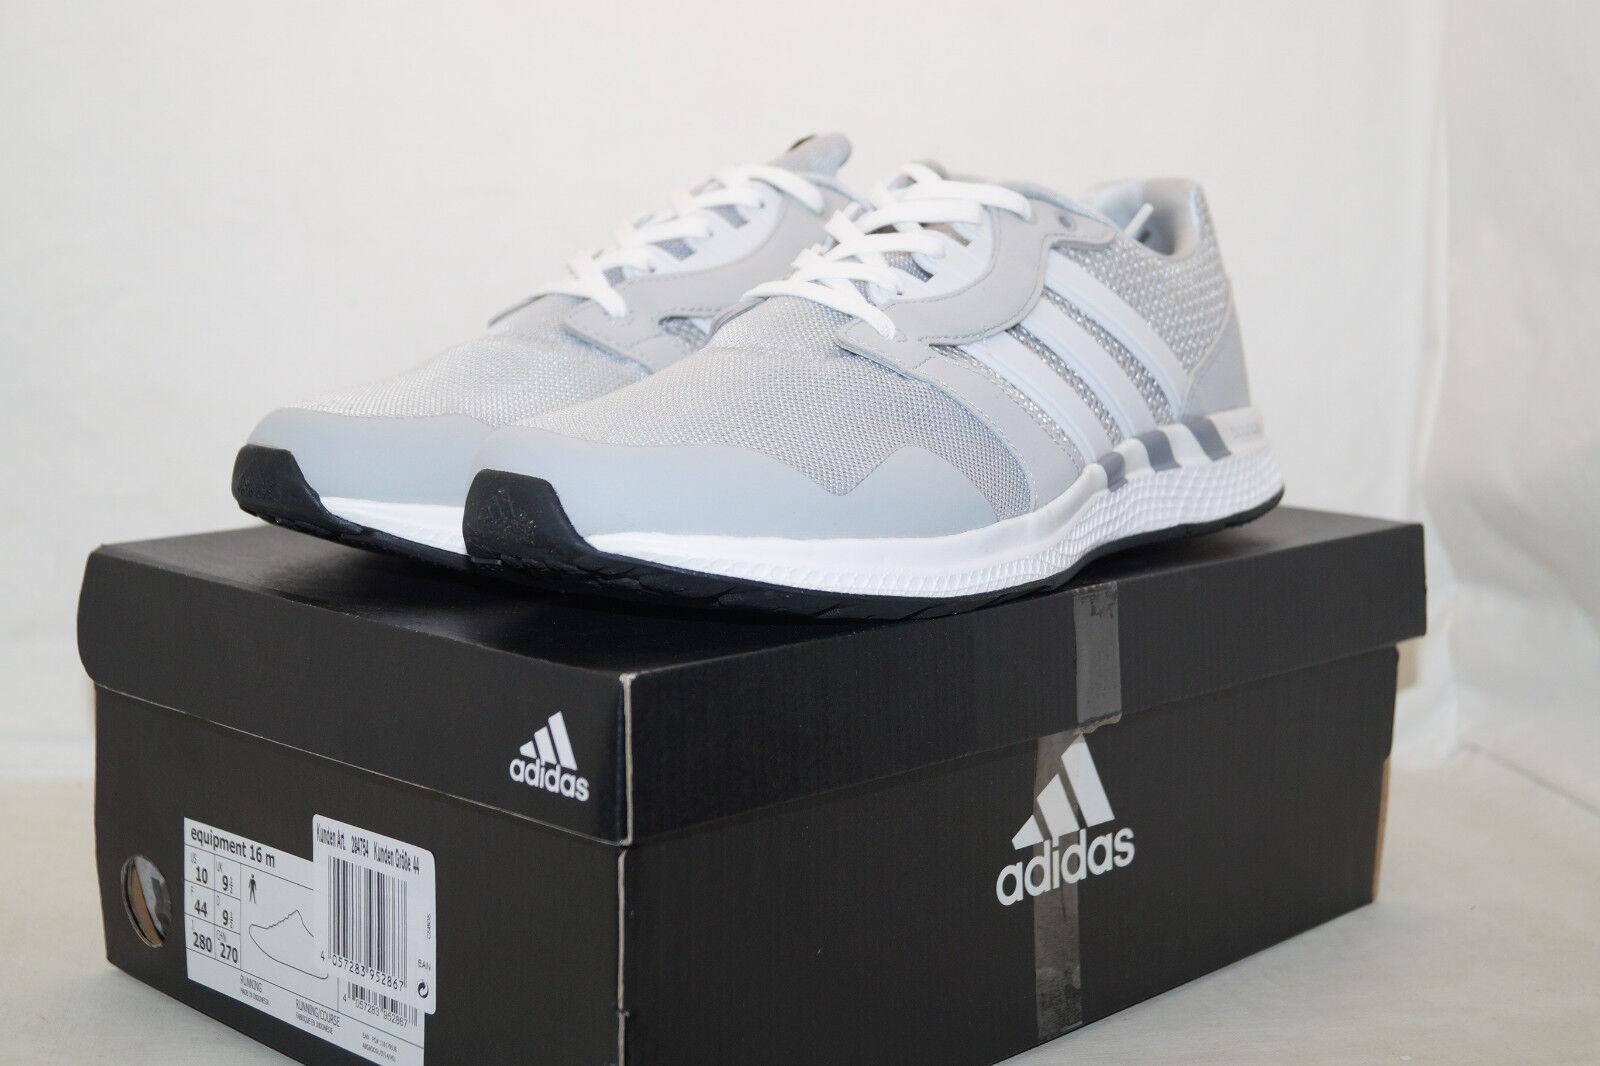 Adidas equipment 16m EU.44 UK 9,5 grau  BW0447 running Laufschuhe